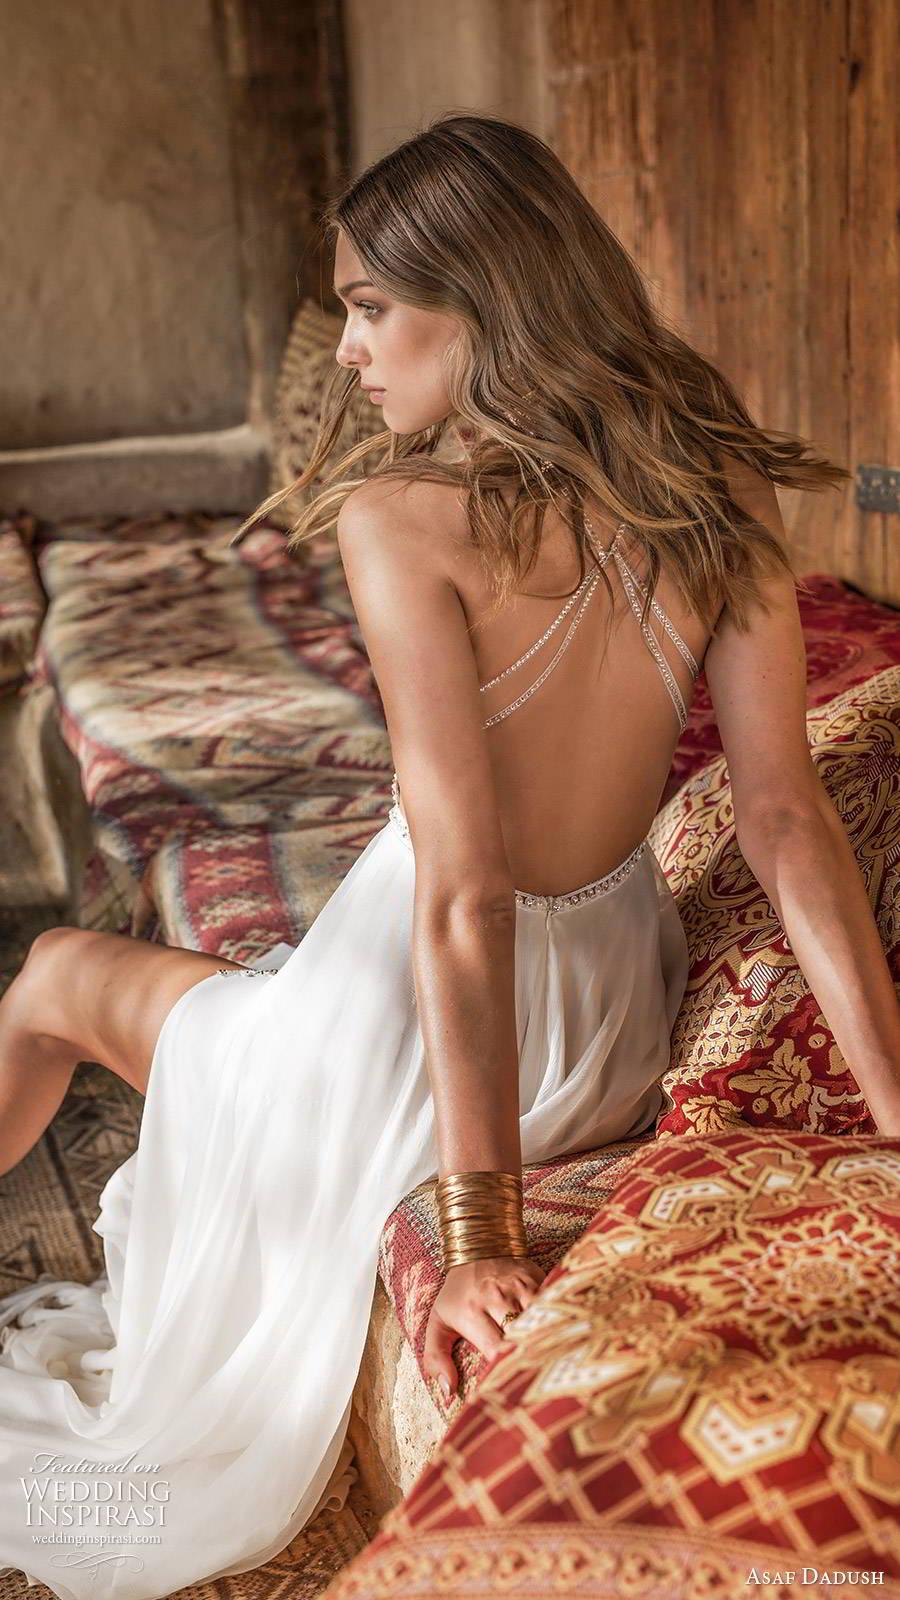 asaf dadush 2019 bridal sleeveless thin straps v neckline embellished bodice double slit skirt glam sexy a line wedding dress (5) zbv